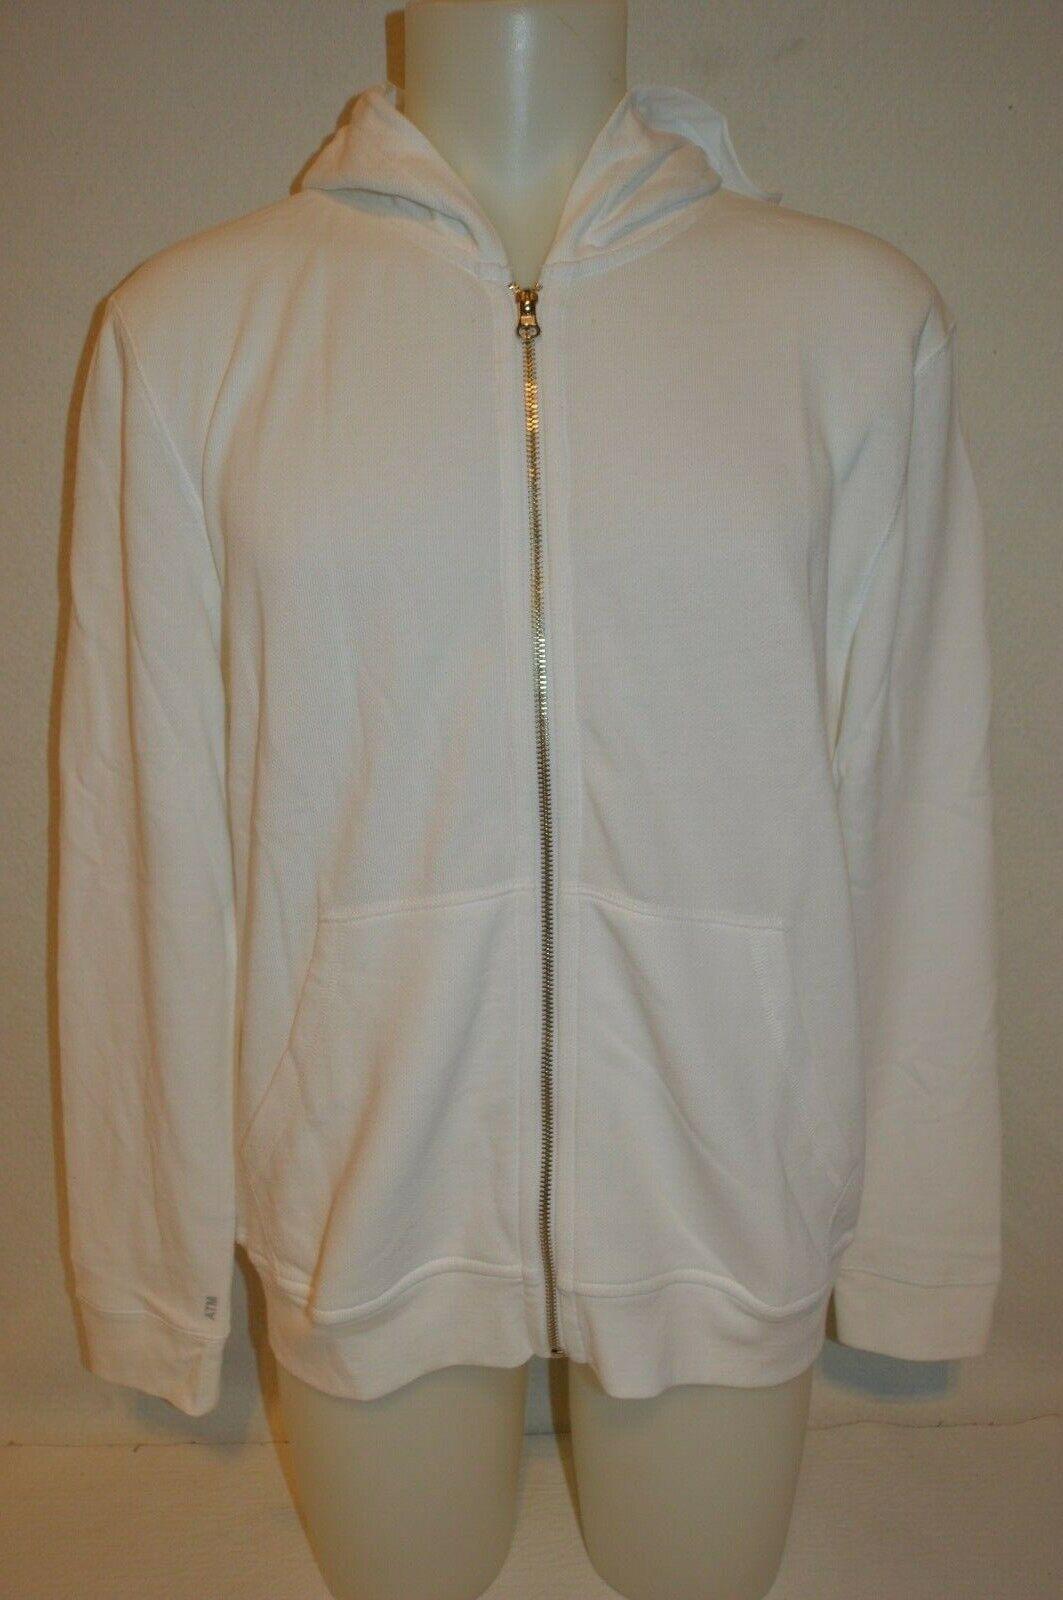 ATM Man's Full Zip Up Premium Sweatshirt Jacket NEW Size Large Retail